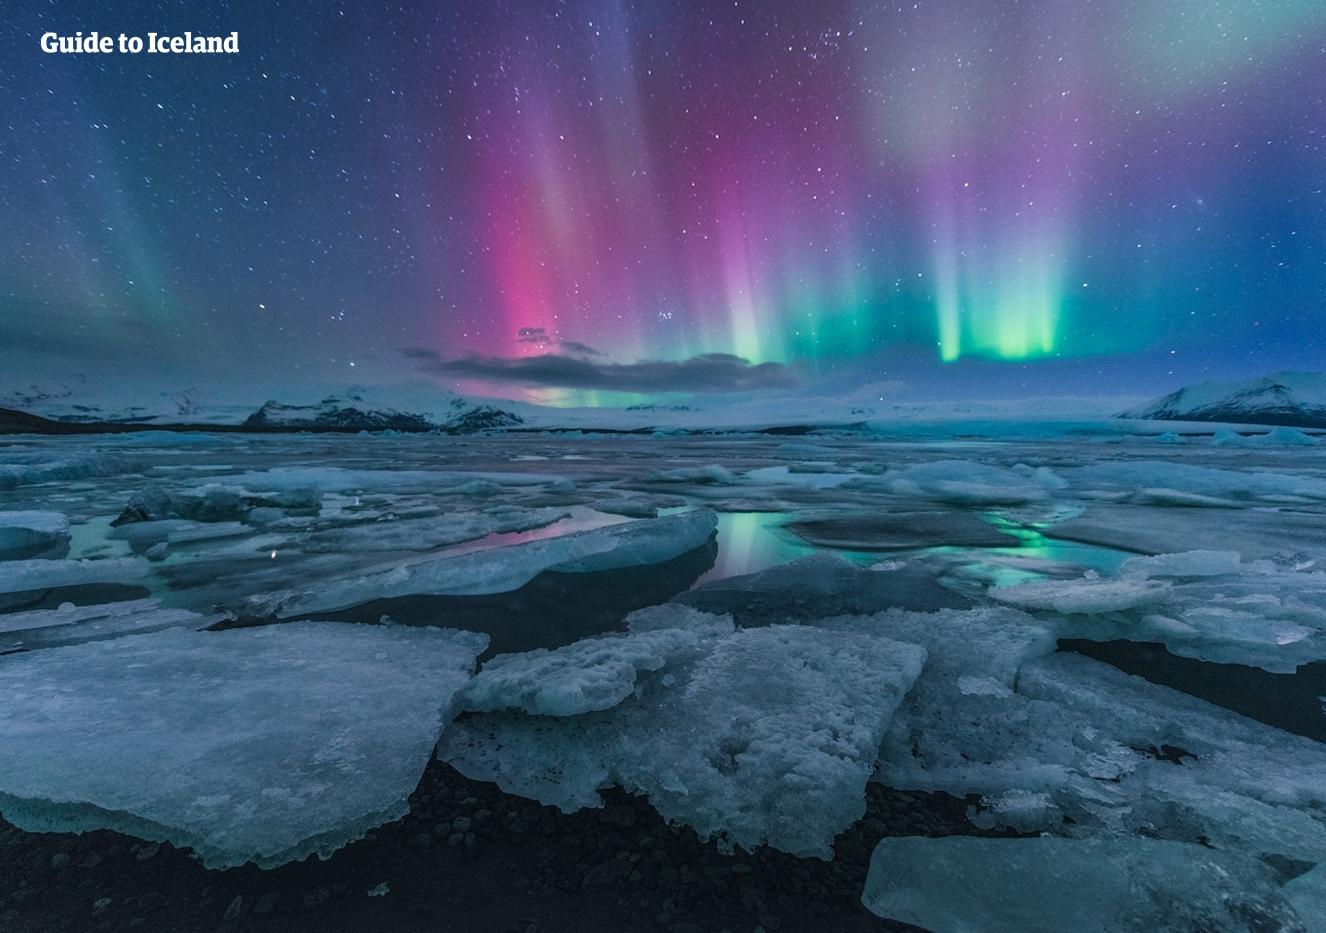 Perhaps you'll see the Northern Lights dancing over Jökulsárlón glacier lagoon on this budget winter tour.